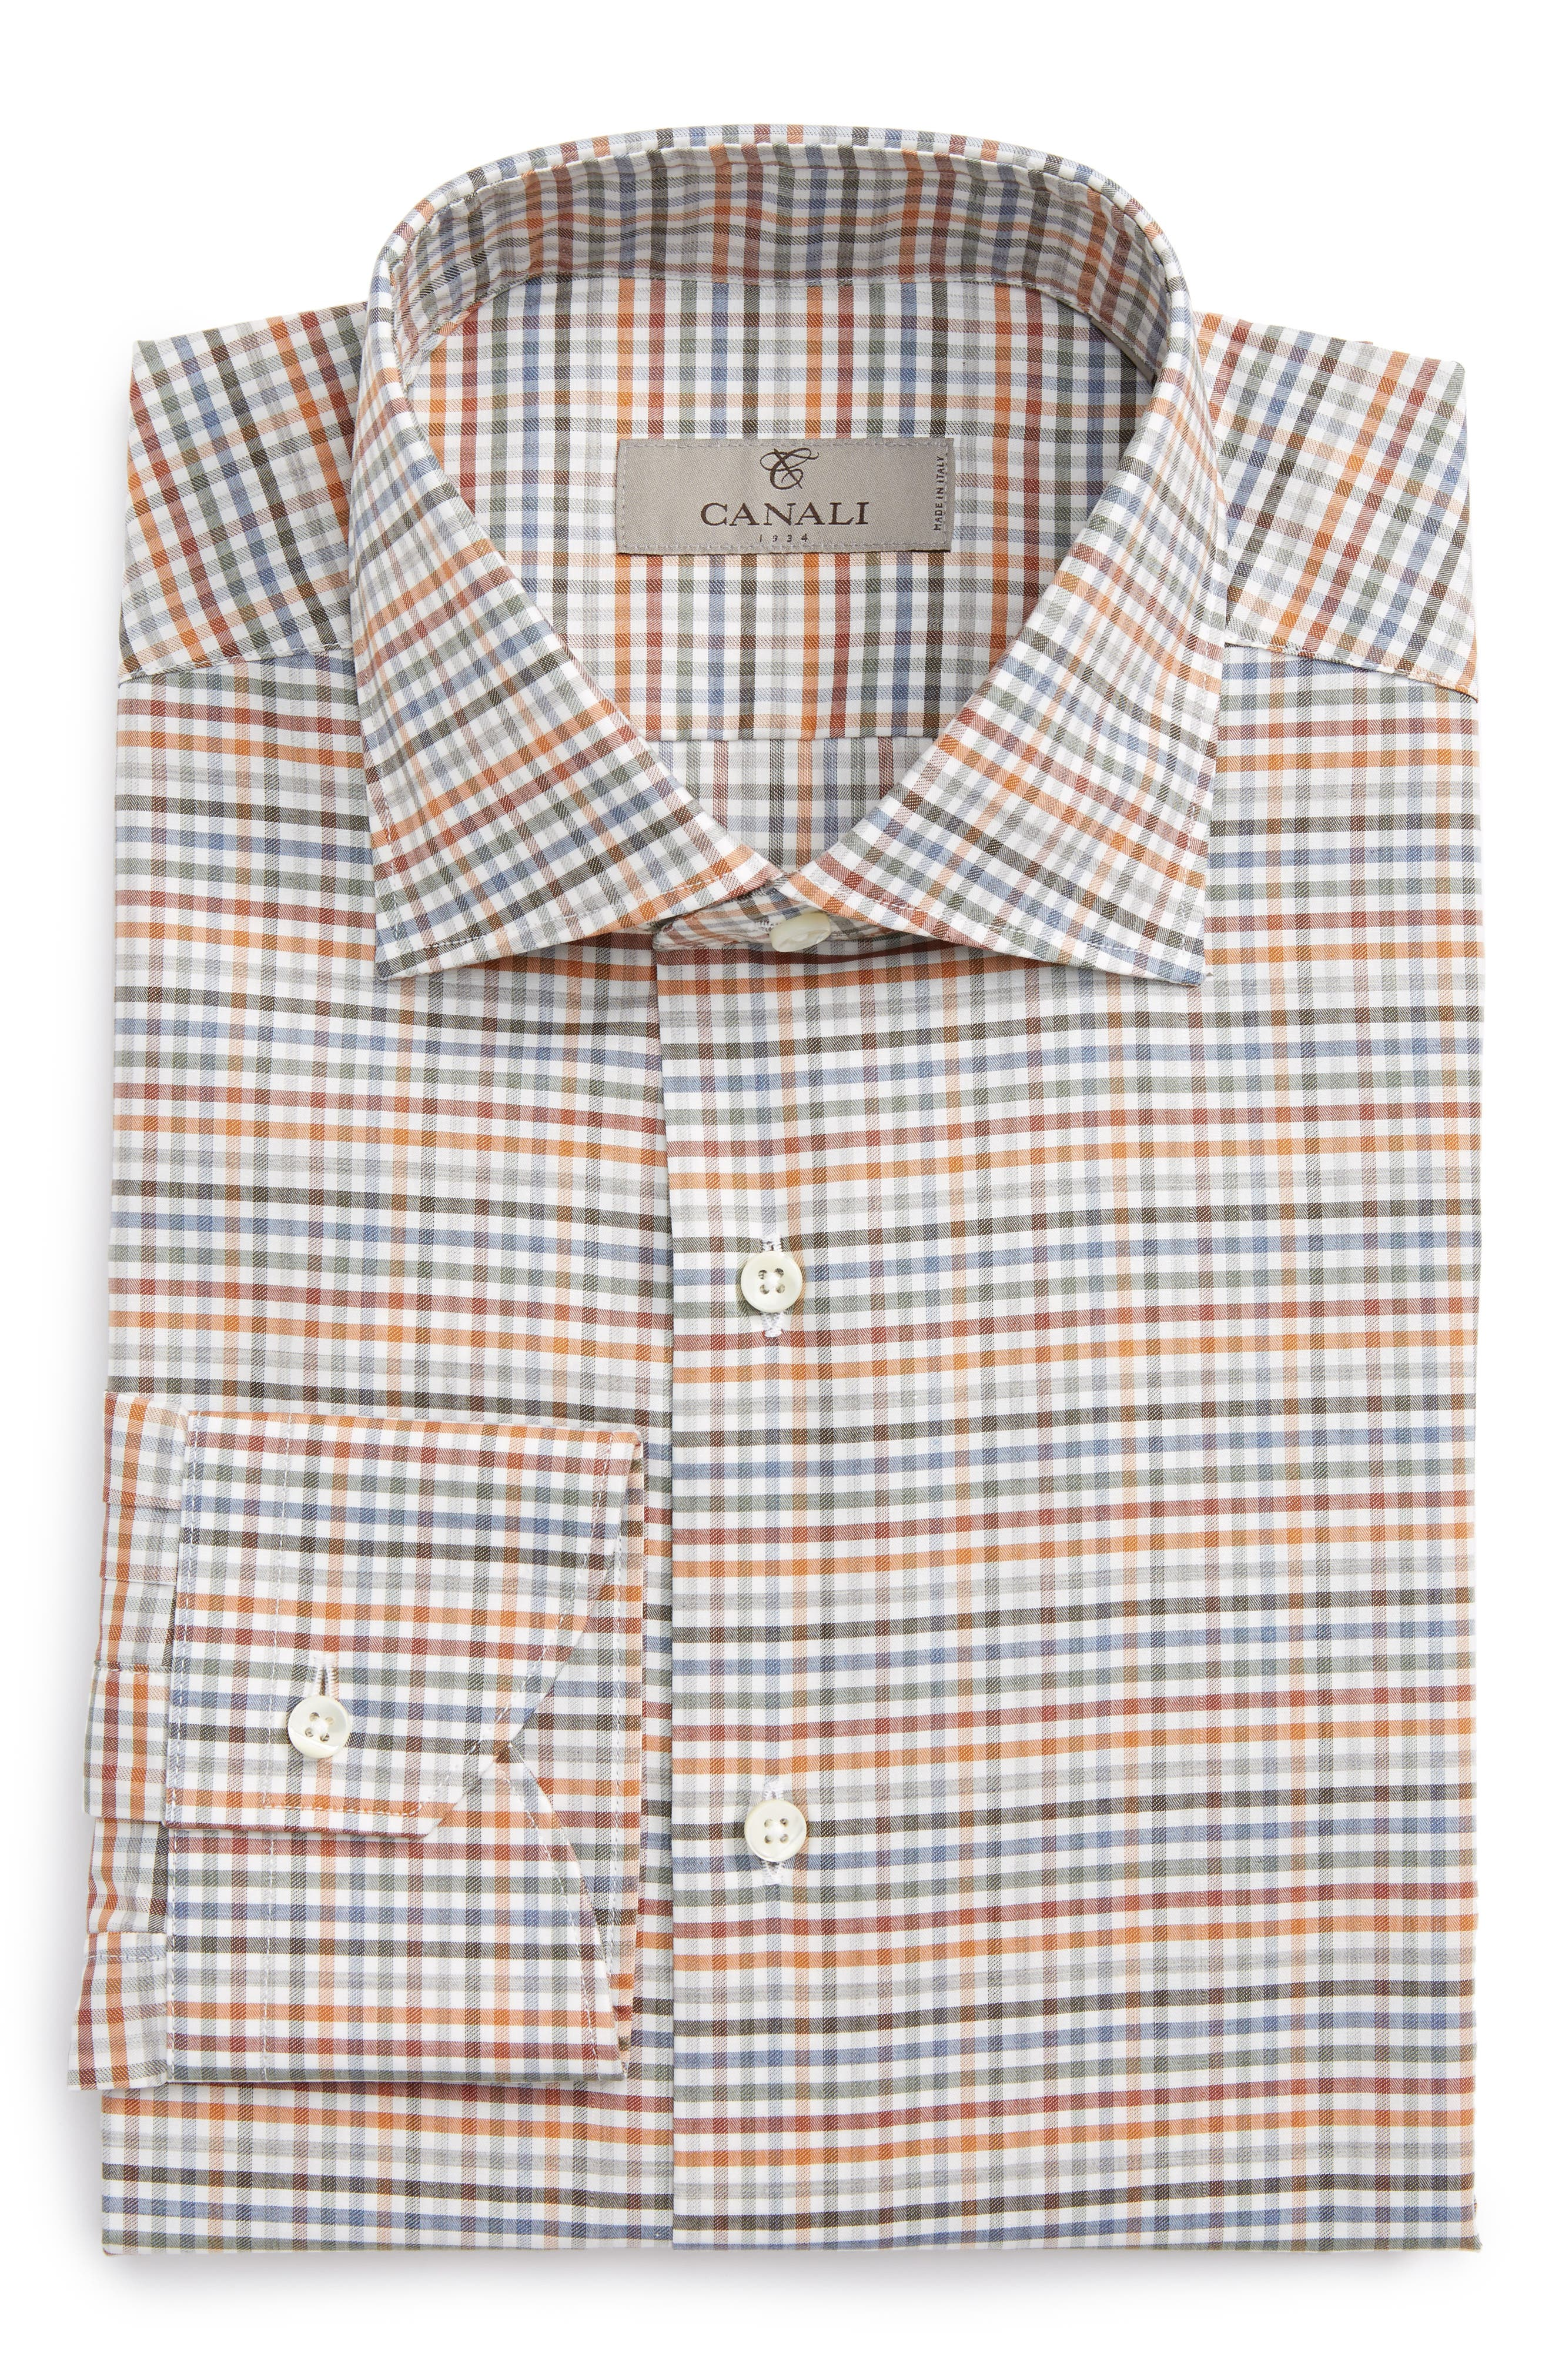 Regular Fit Check Dress Shirt,                         Main,                         color, Orange/ Green